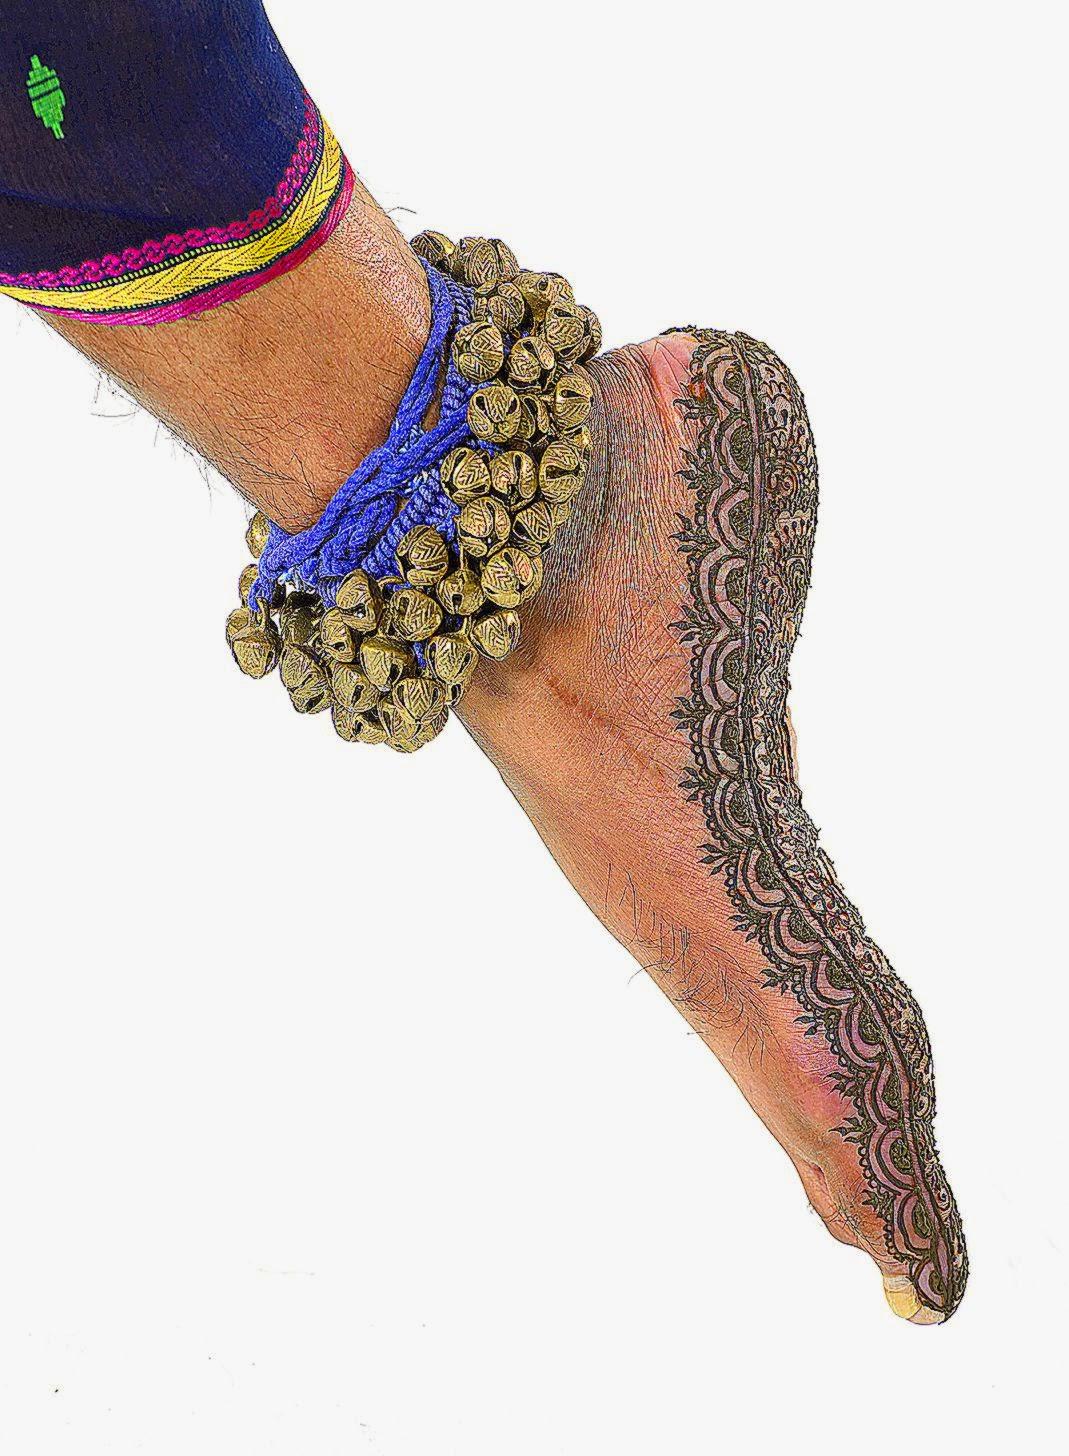 Henna and Body Art